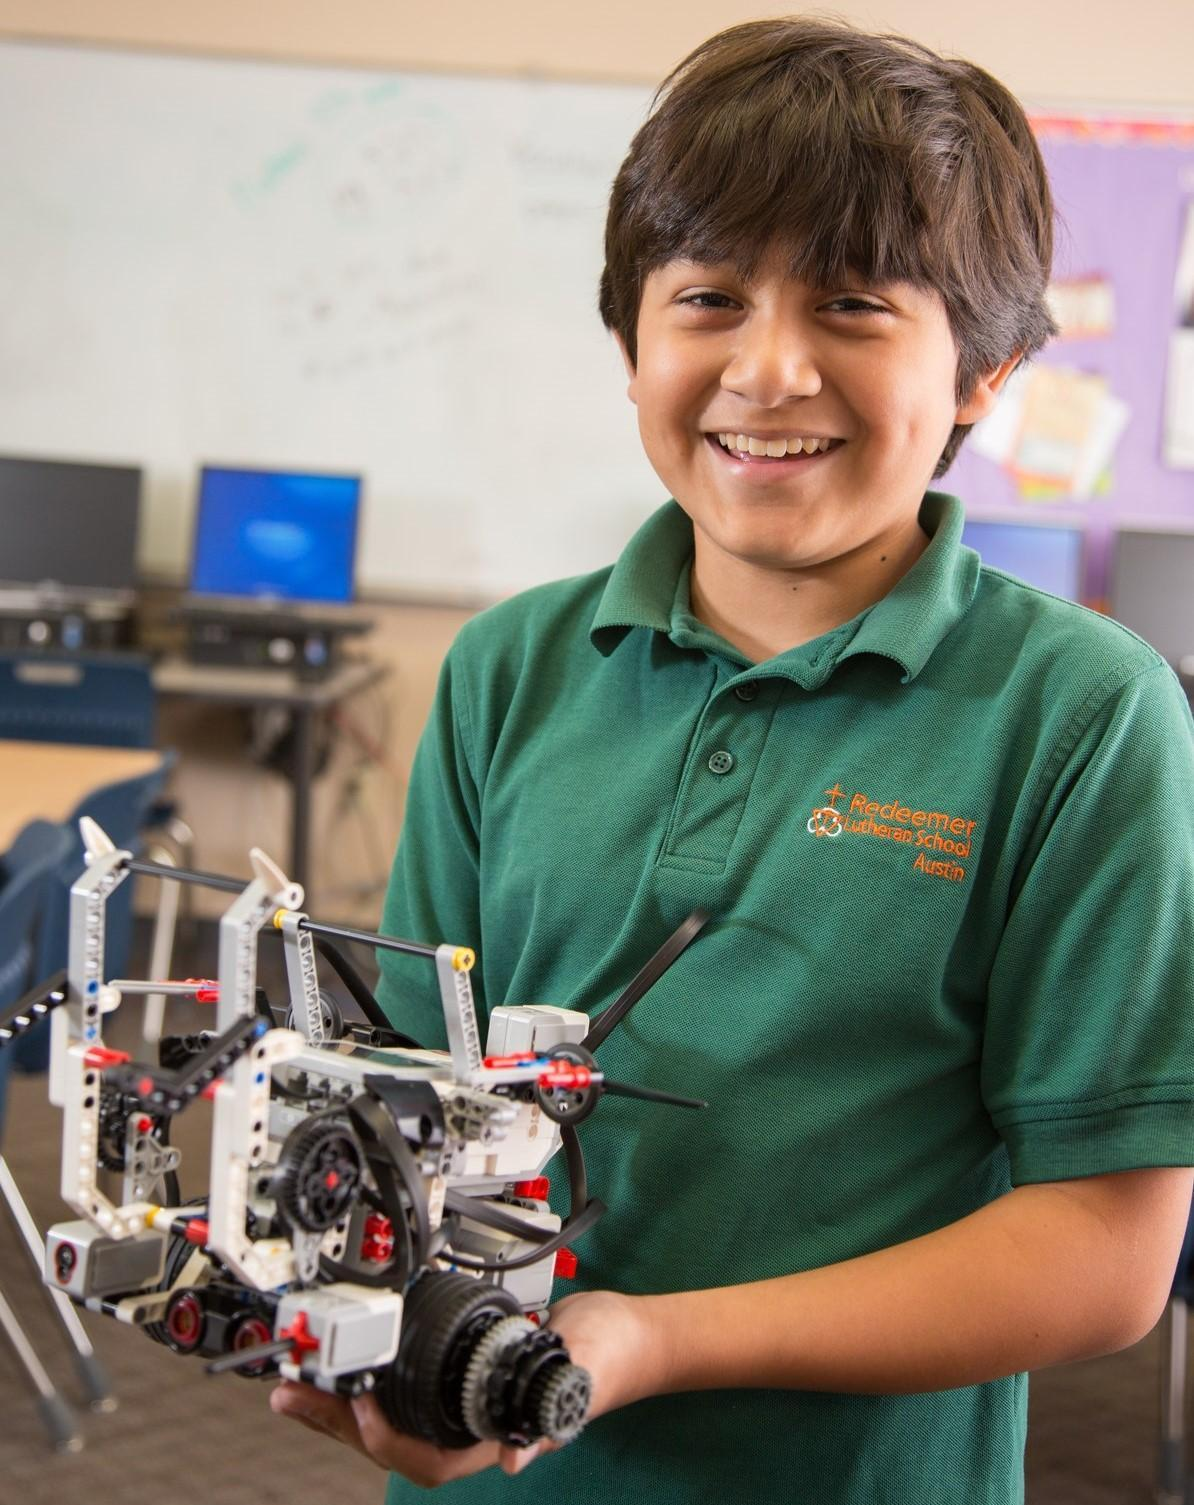 Student holding robot